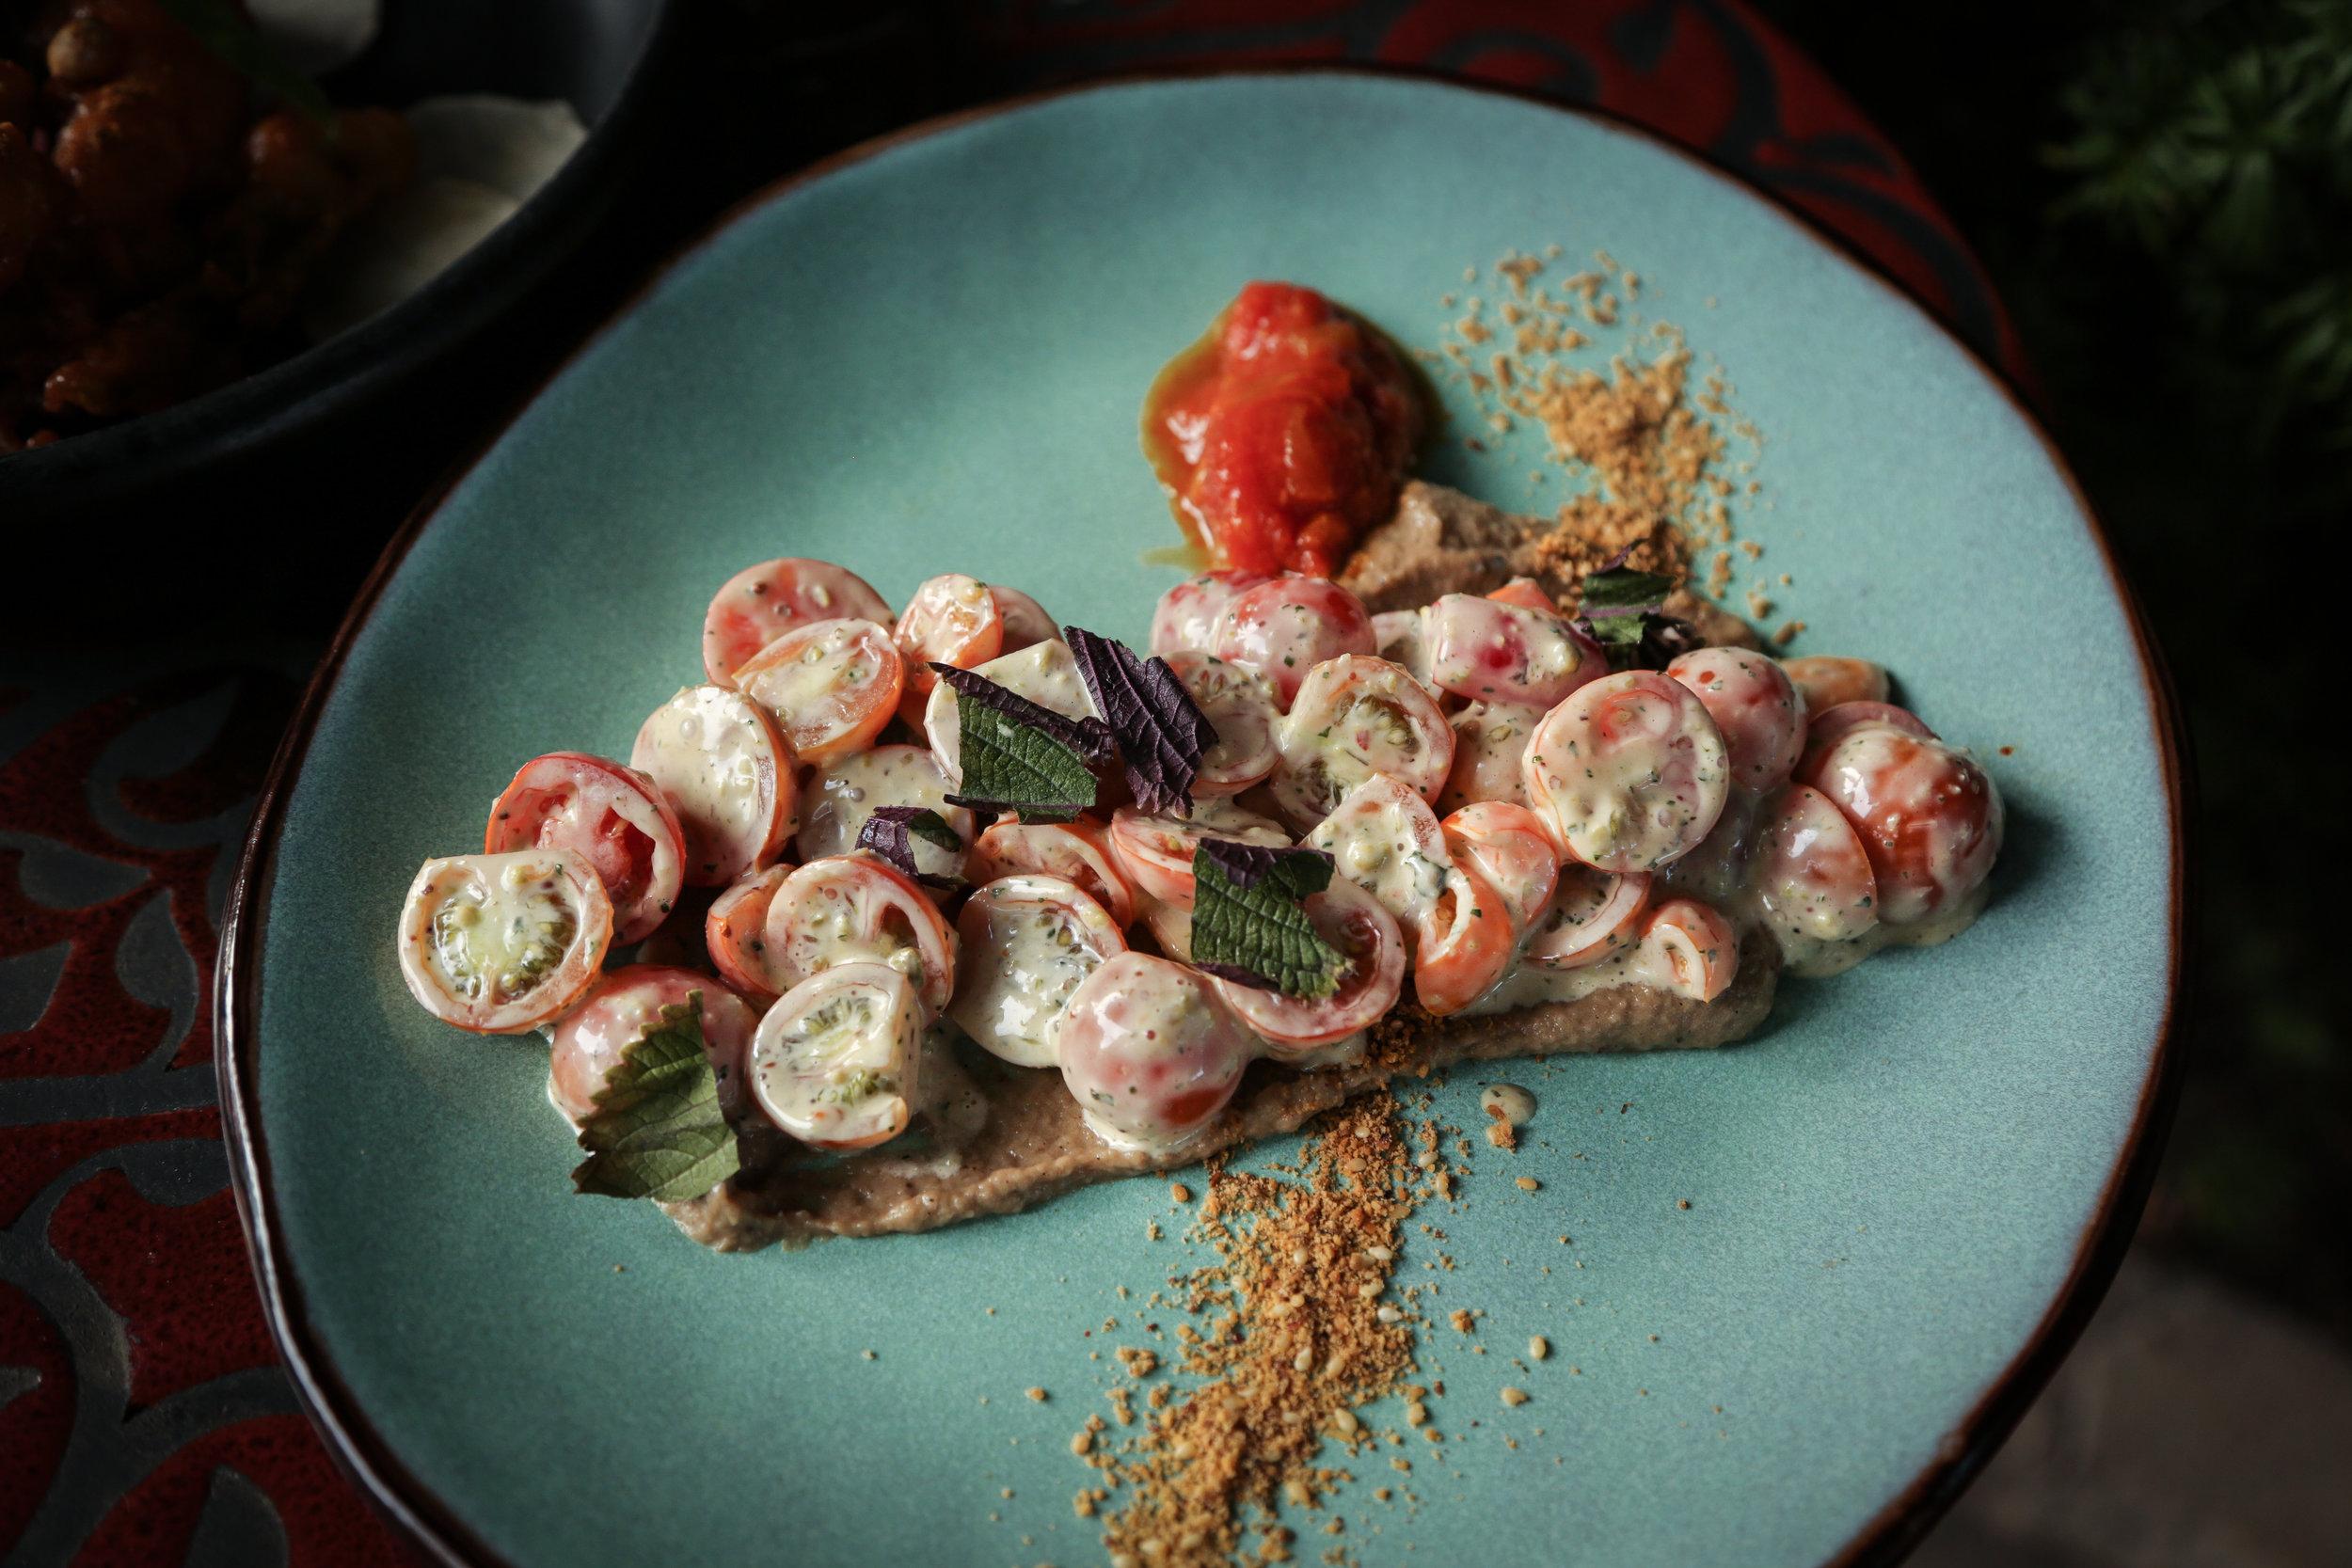 Cherry Tomato Salad | anchovy aioli | smoked eggplant | dukkah | green olive